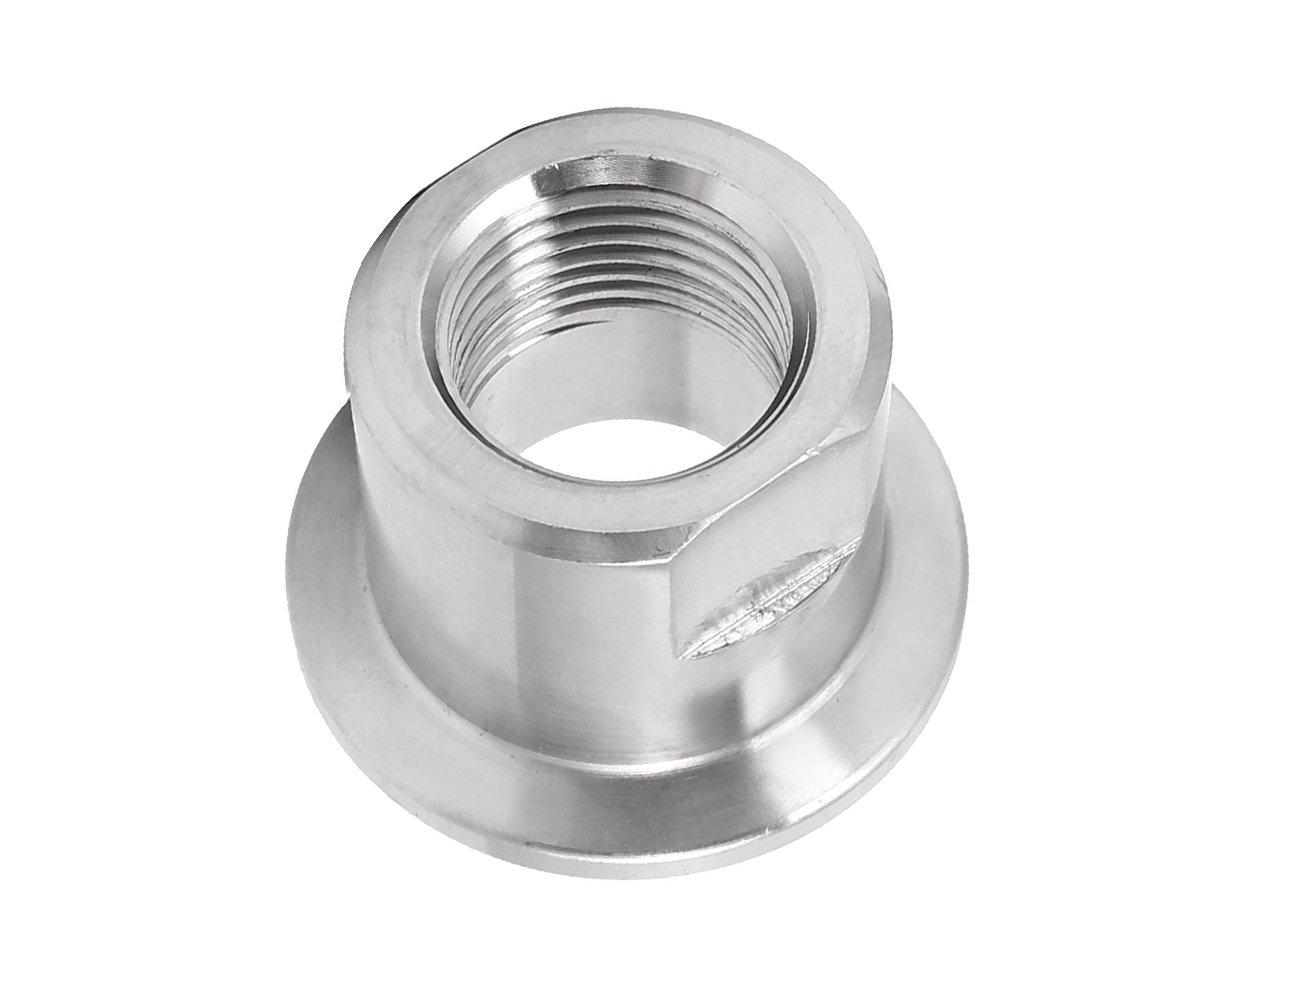 KF25 Vacuum Flange 1/2BSP Female Thread 304 Stainless Steel Barb Adapter Silver Tone